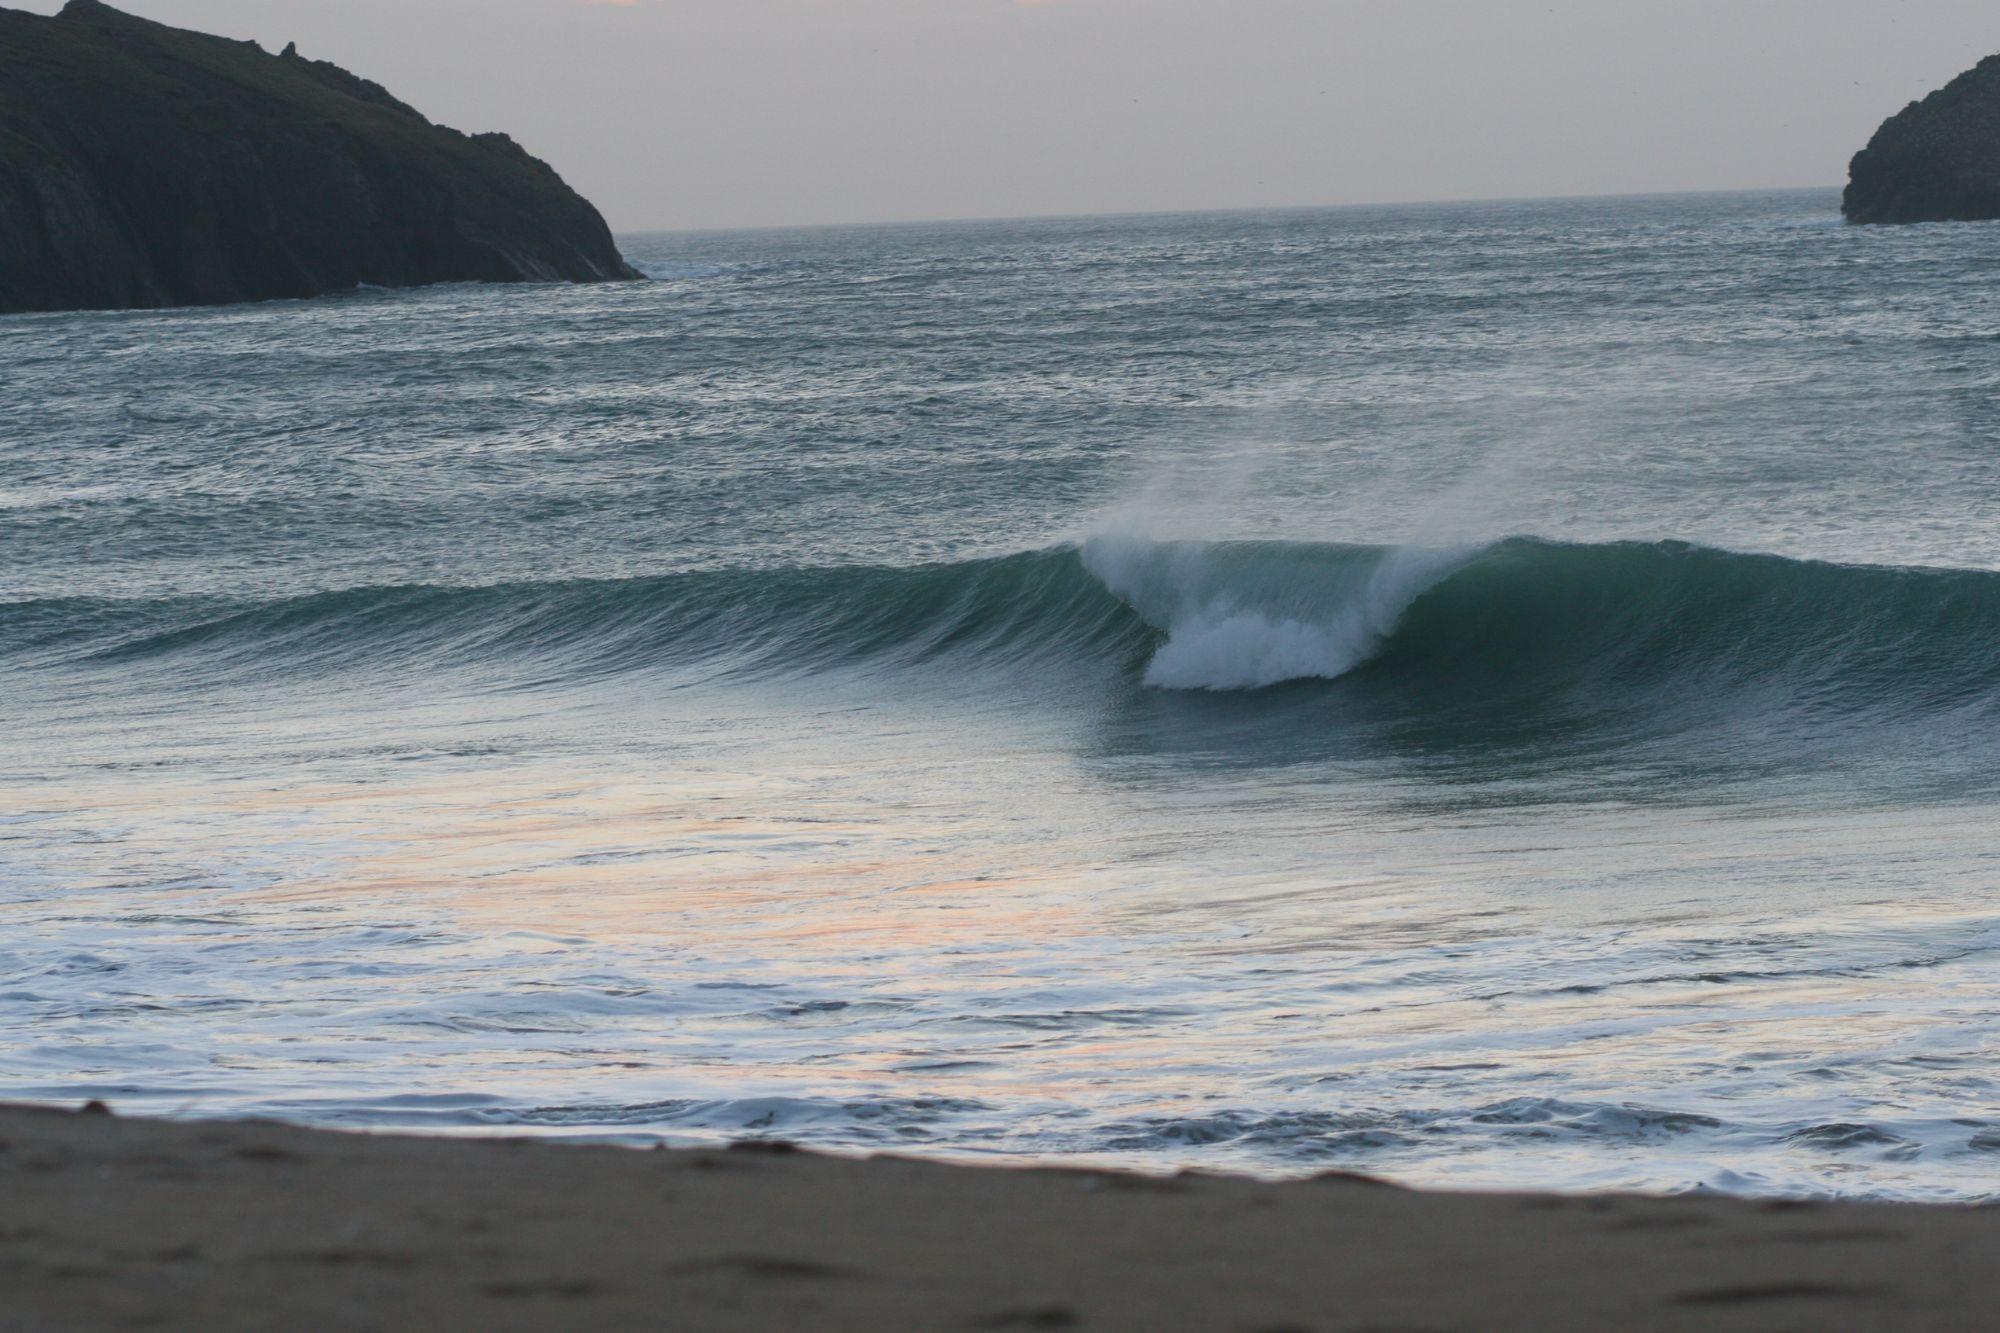 surfing at holywell bay holywell bay slsc